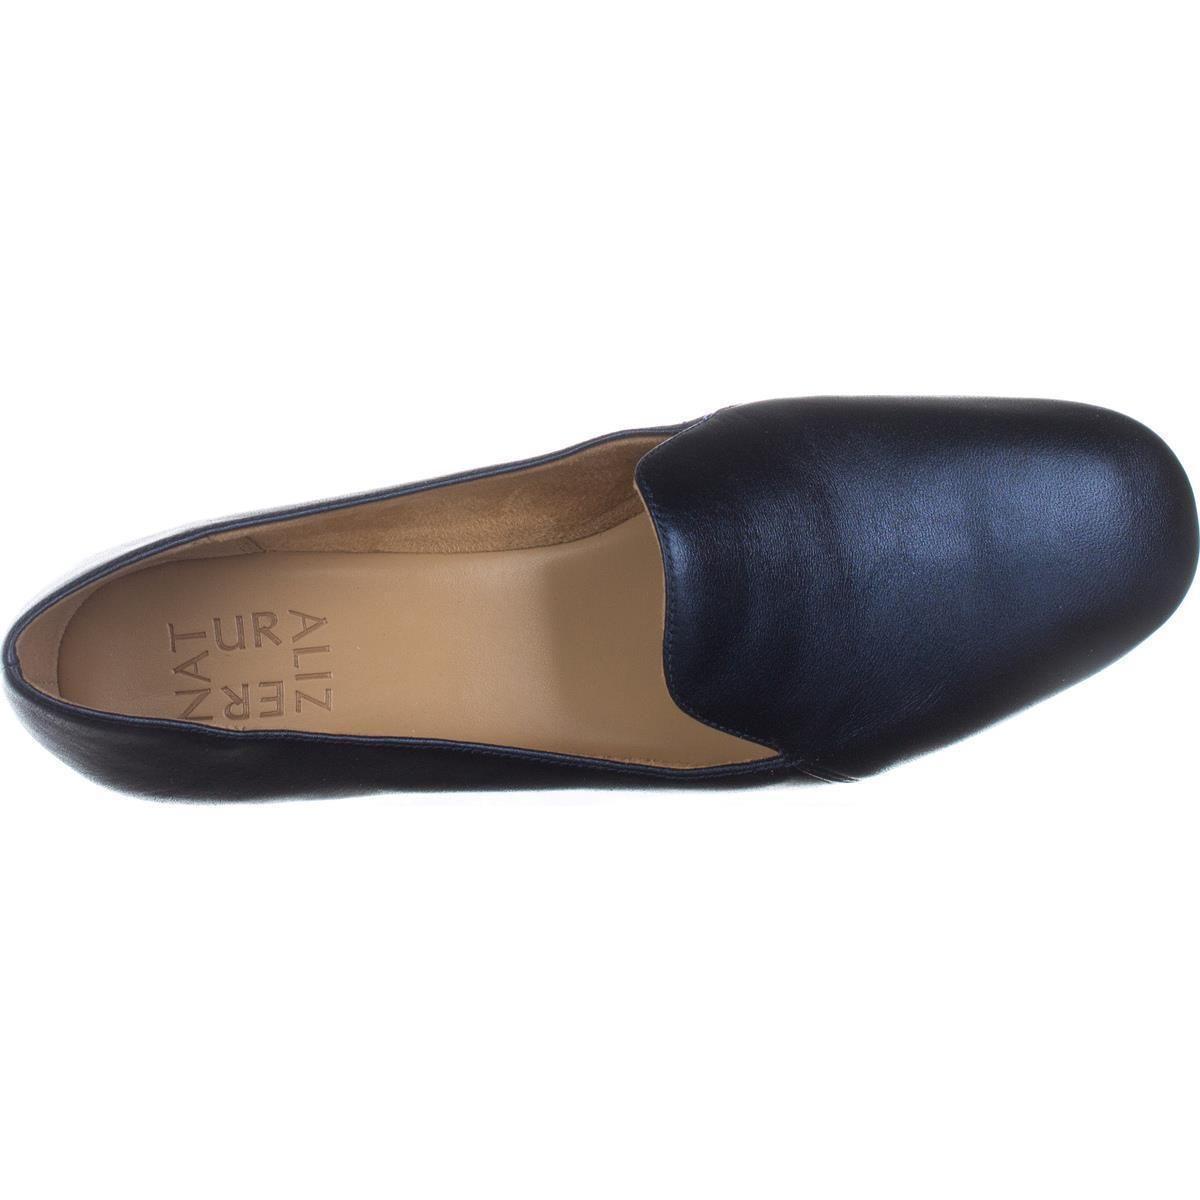 9a796b7cd28 Naturalizer - Blue Emiline Classic Slip On Loafers - Lyst. View fullscreen